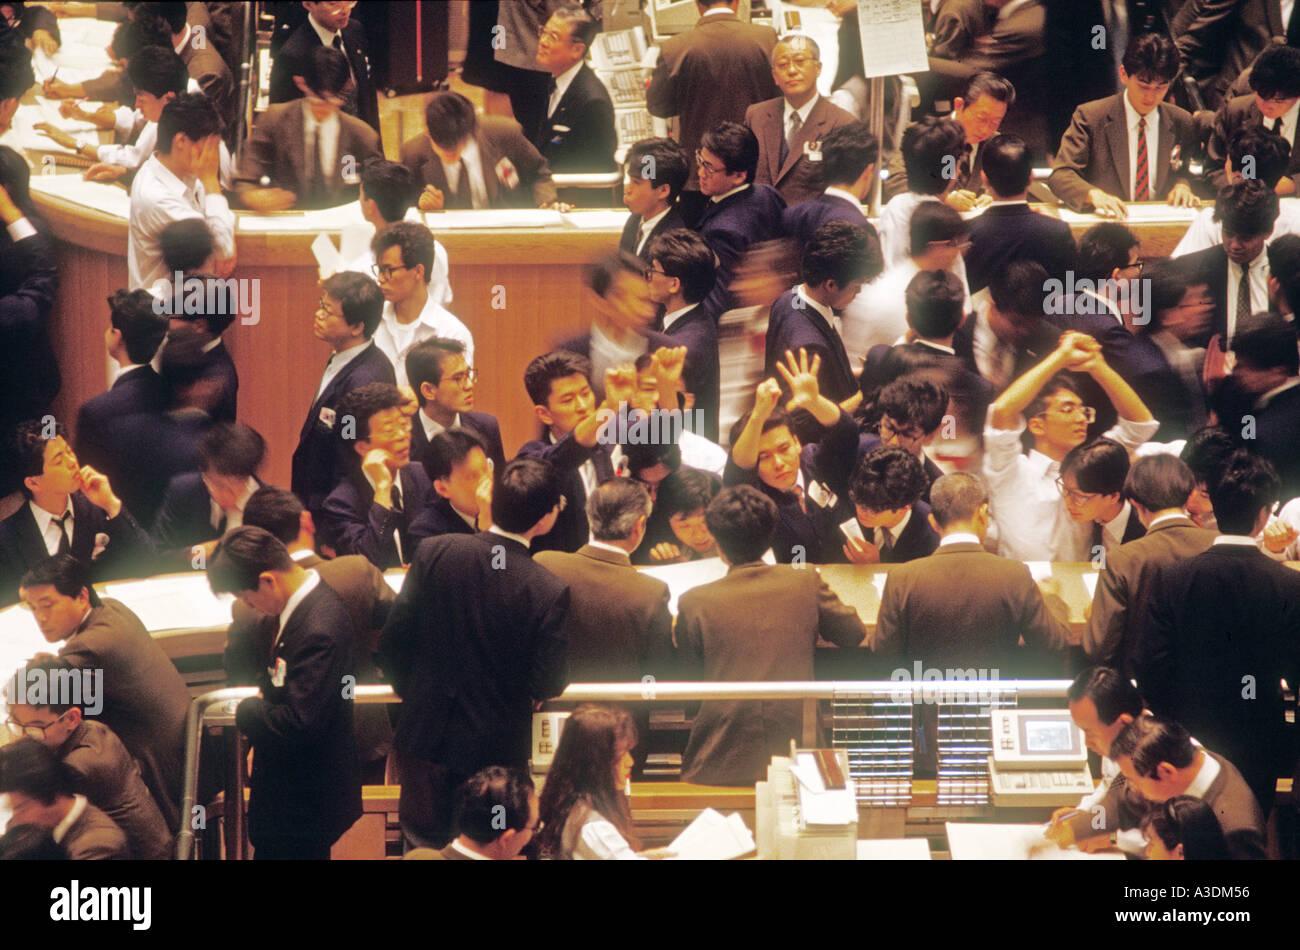 fe46c8191e Japan Tokyo stock exchange trading floor crowds business - Stock Image